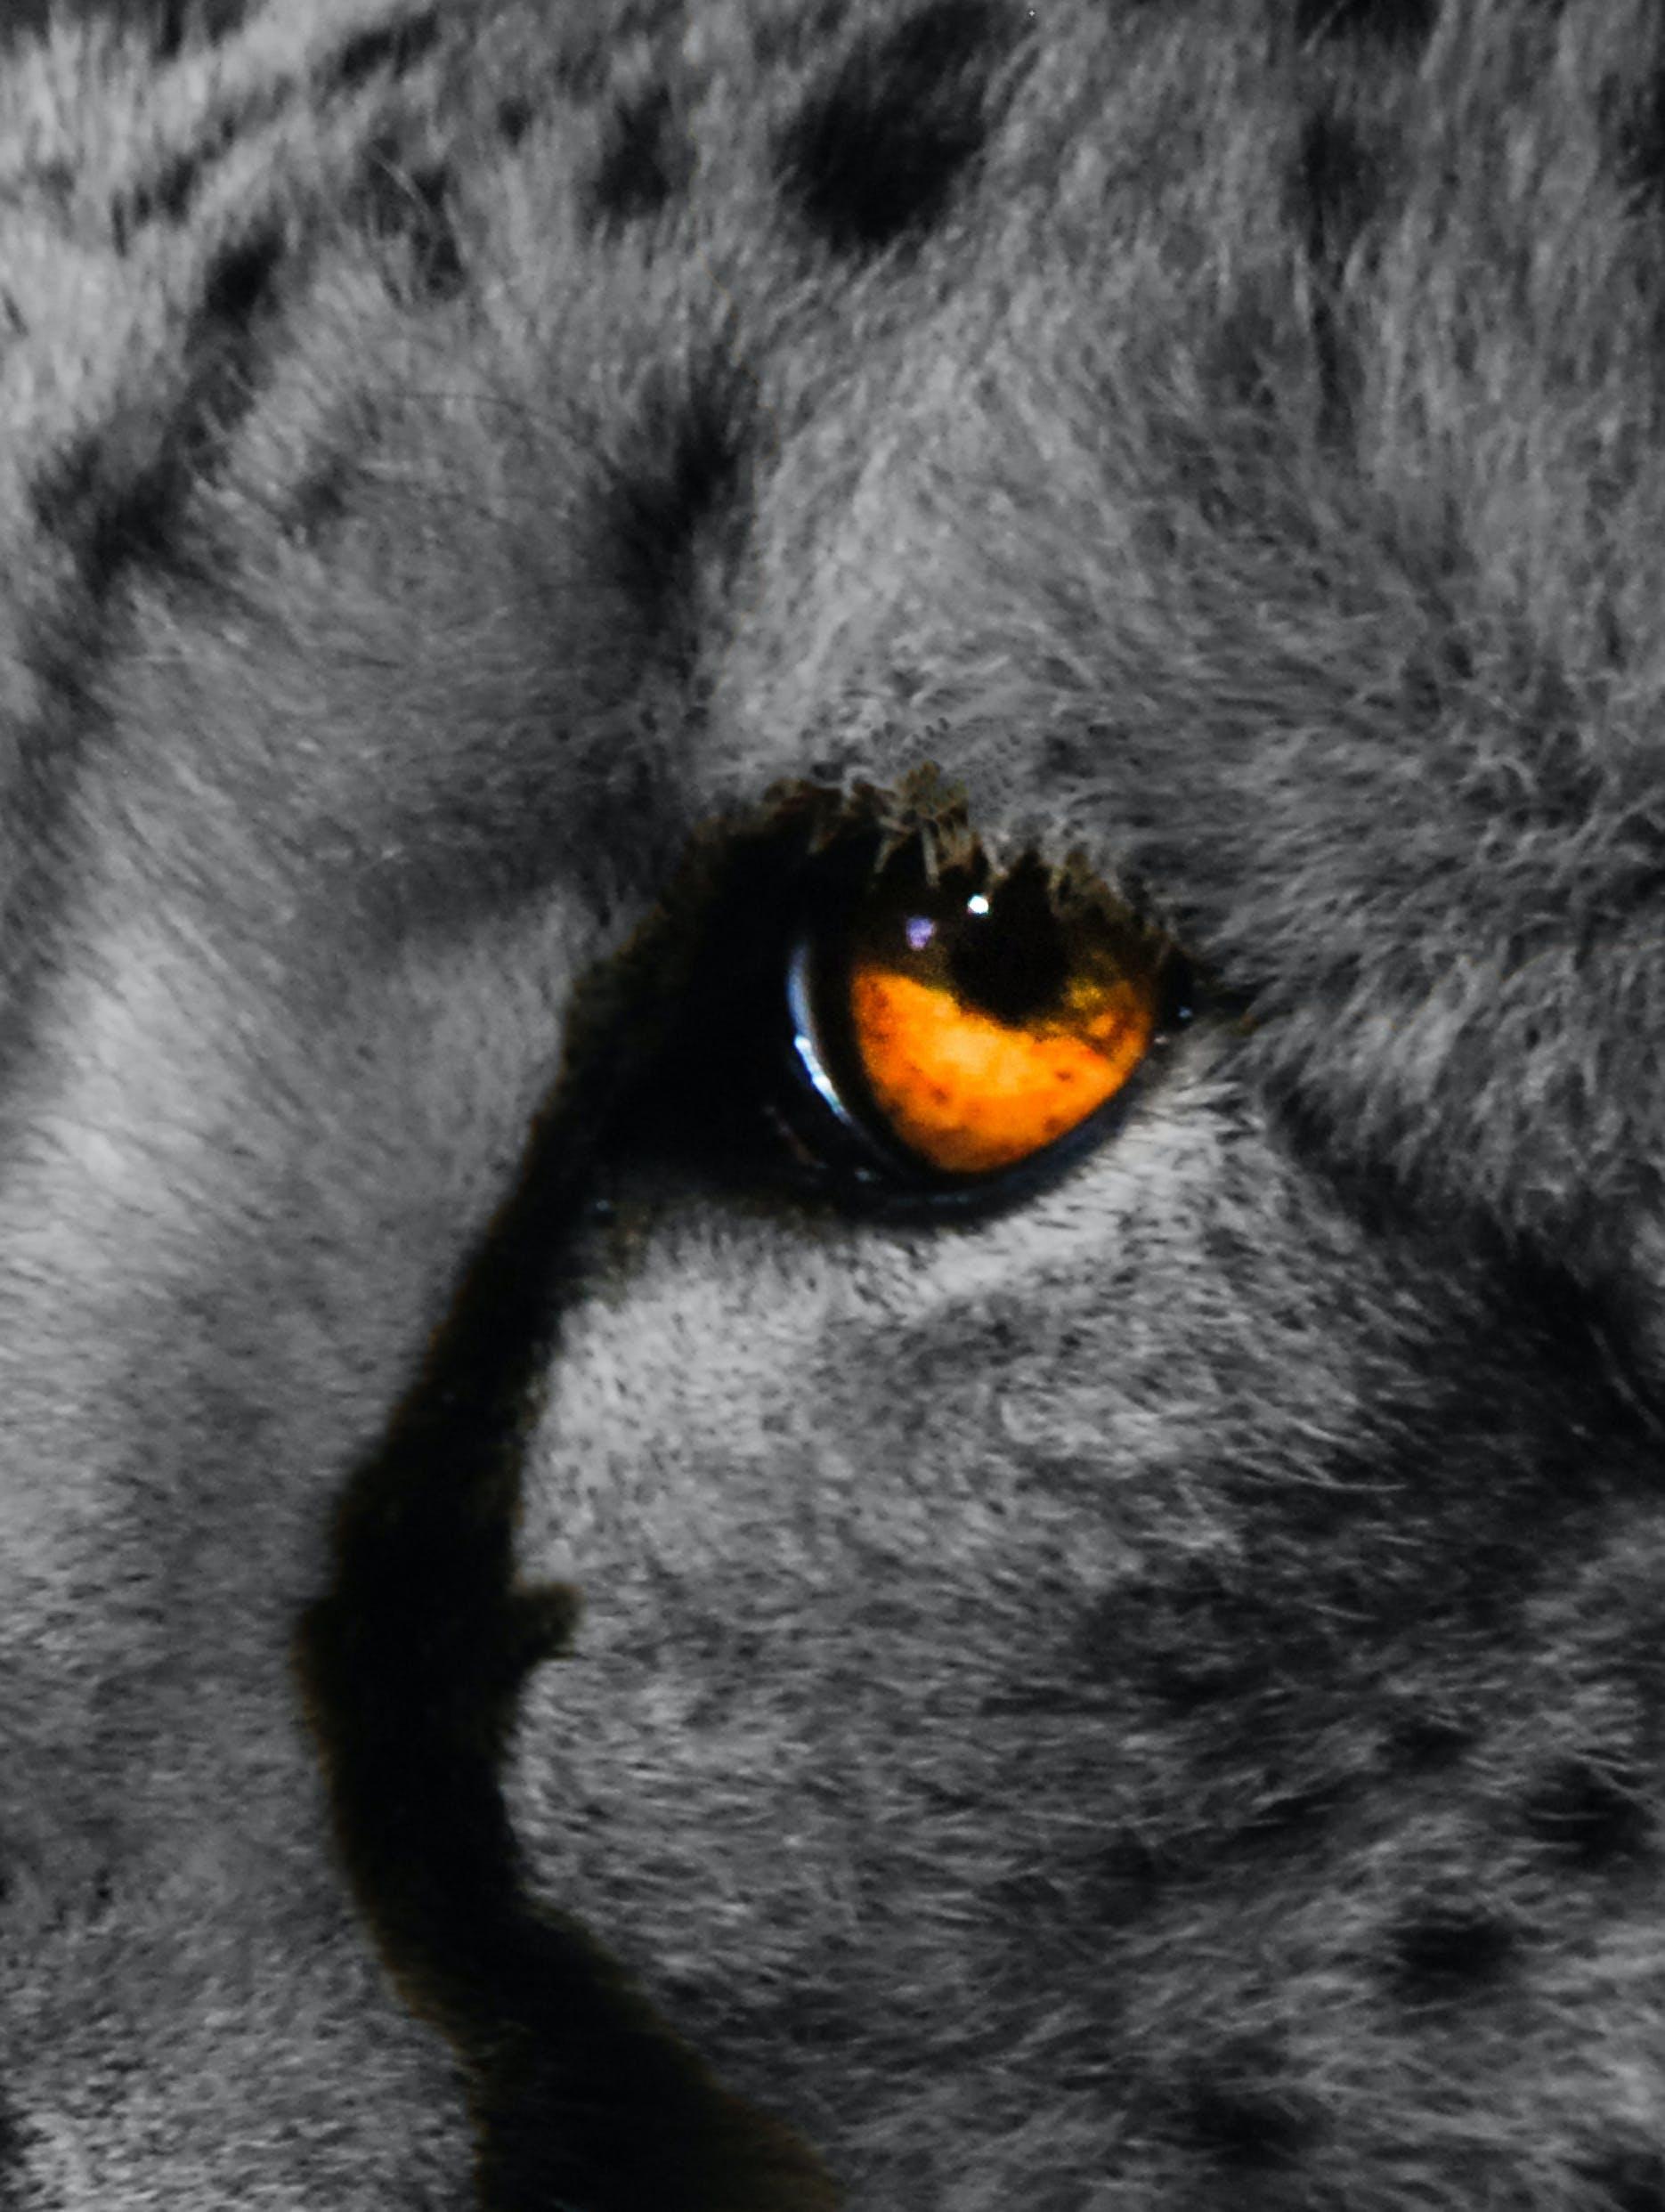 Free stock photo of cheetah, eye, wild animal in black and white